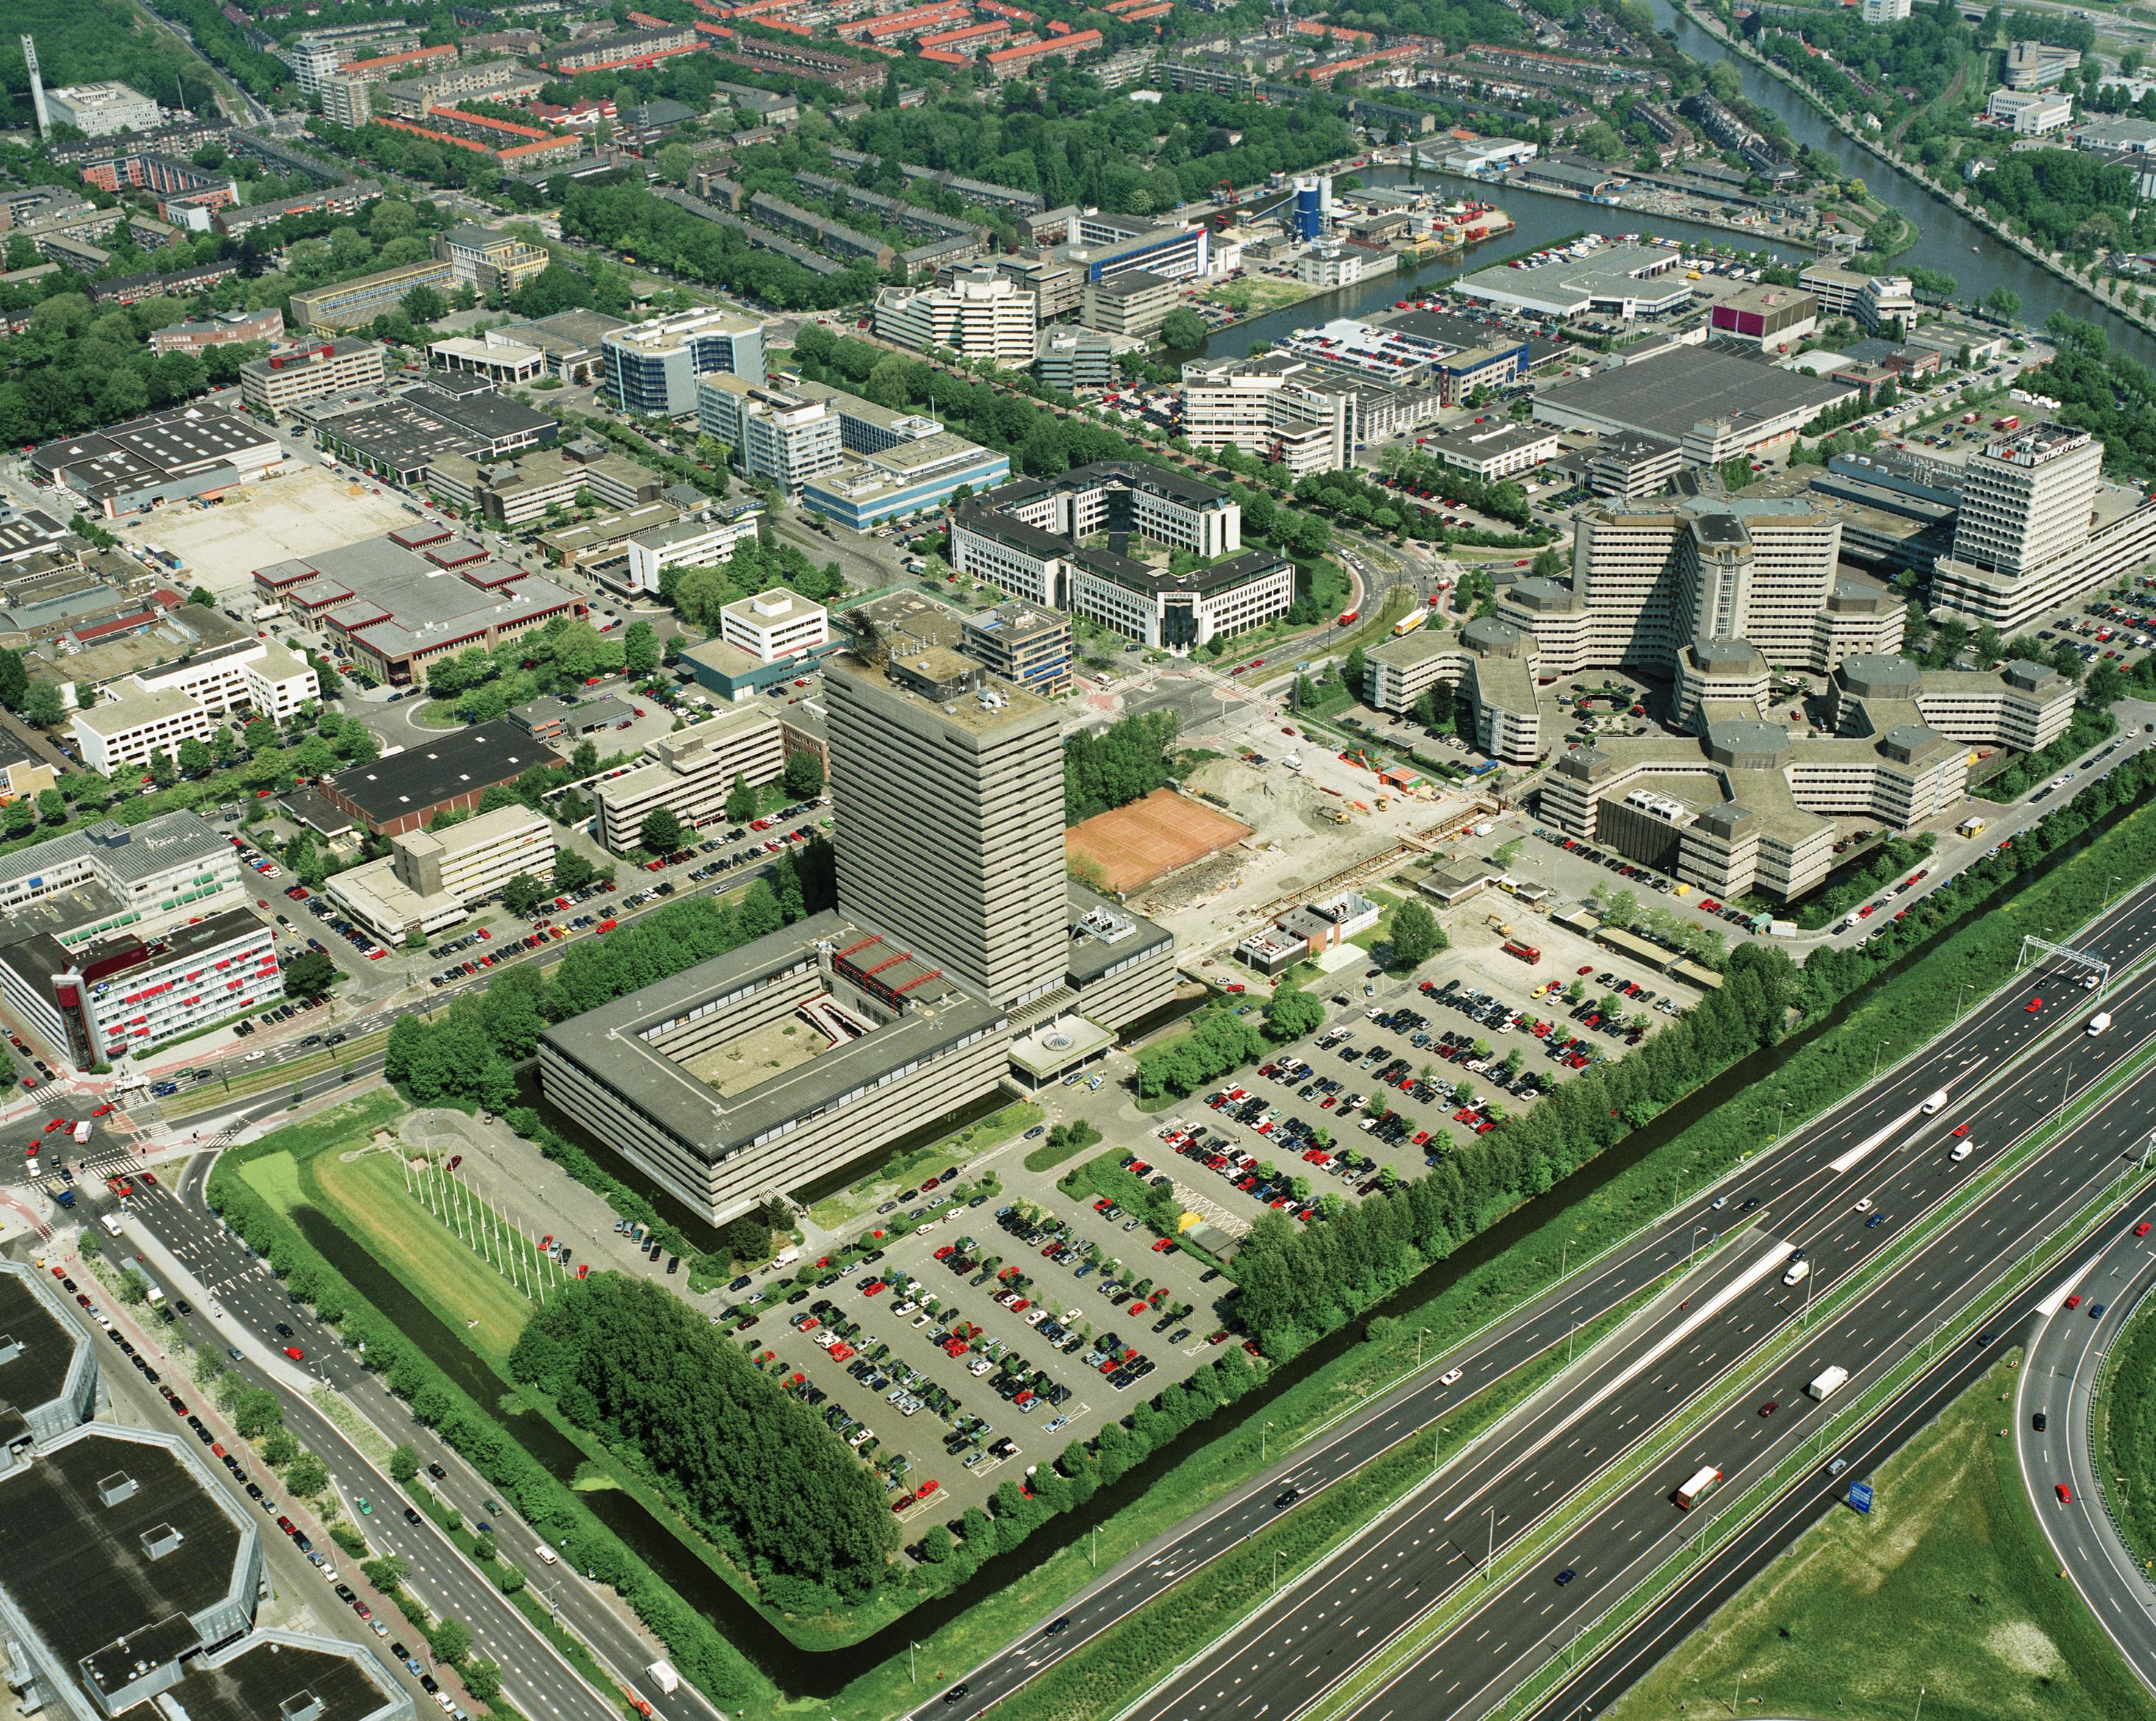 A campo architecten european patent office rijswijk - European patent office rijswijk ...